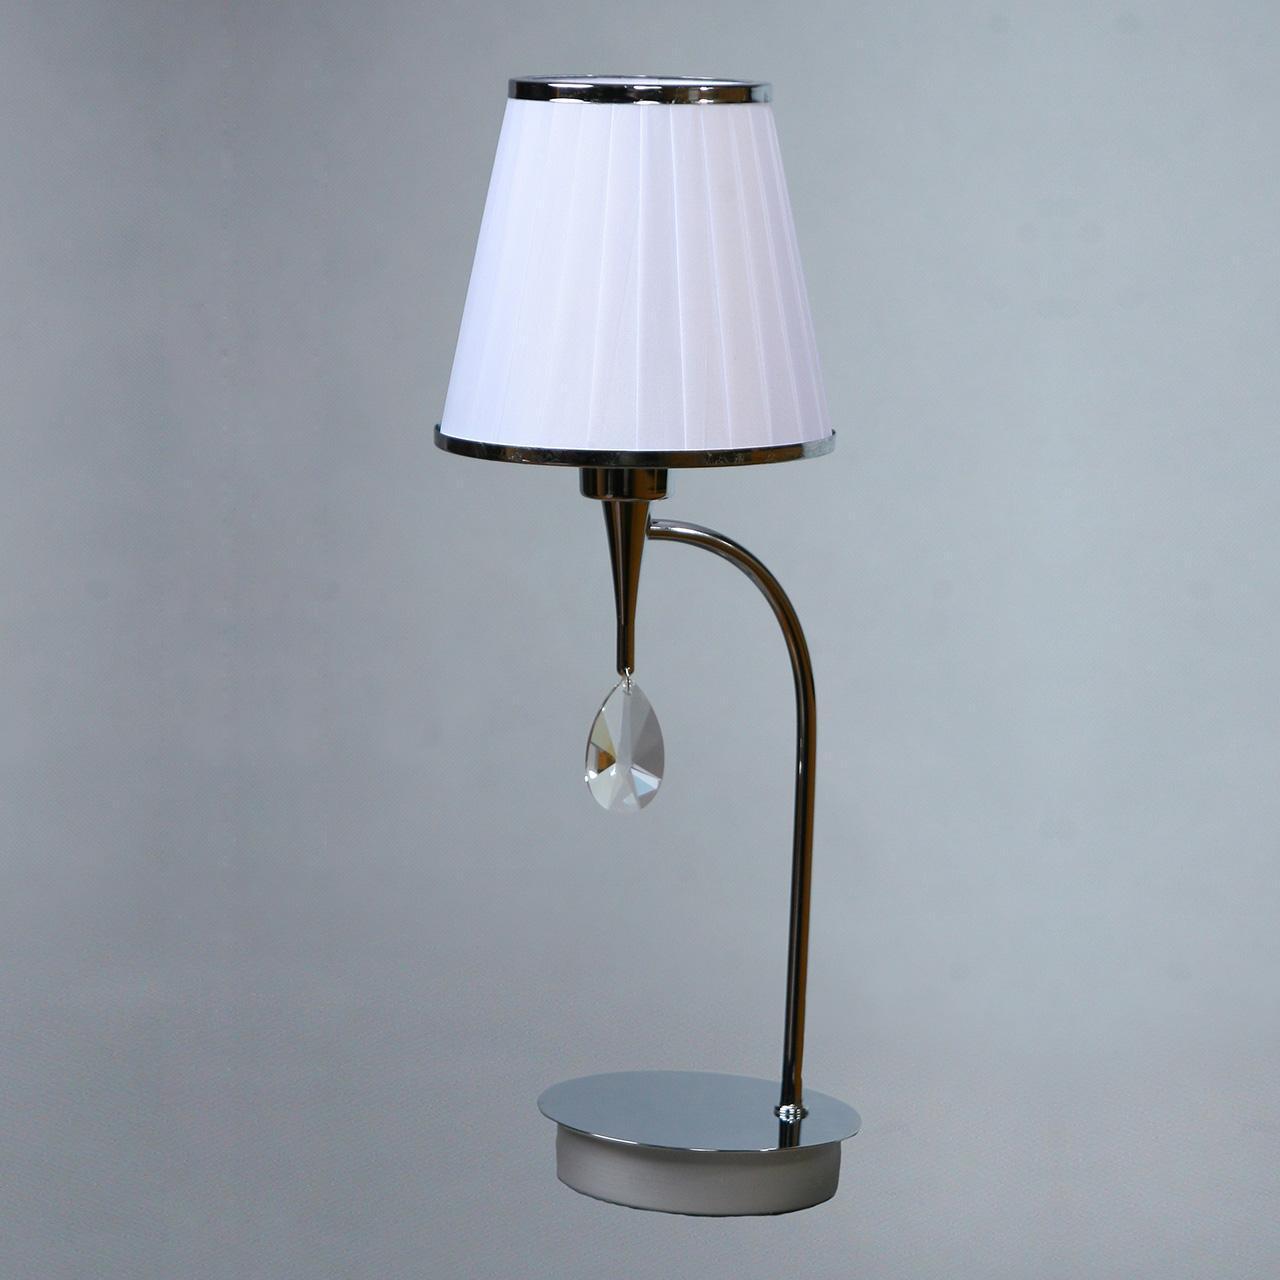 Настольная лампа Brizzi Alora MA 01625T/001 Chrome недорго, оригинальная цена